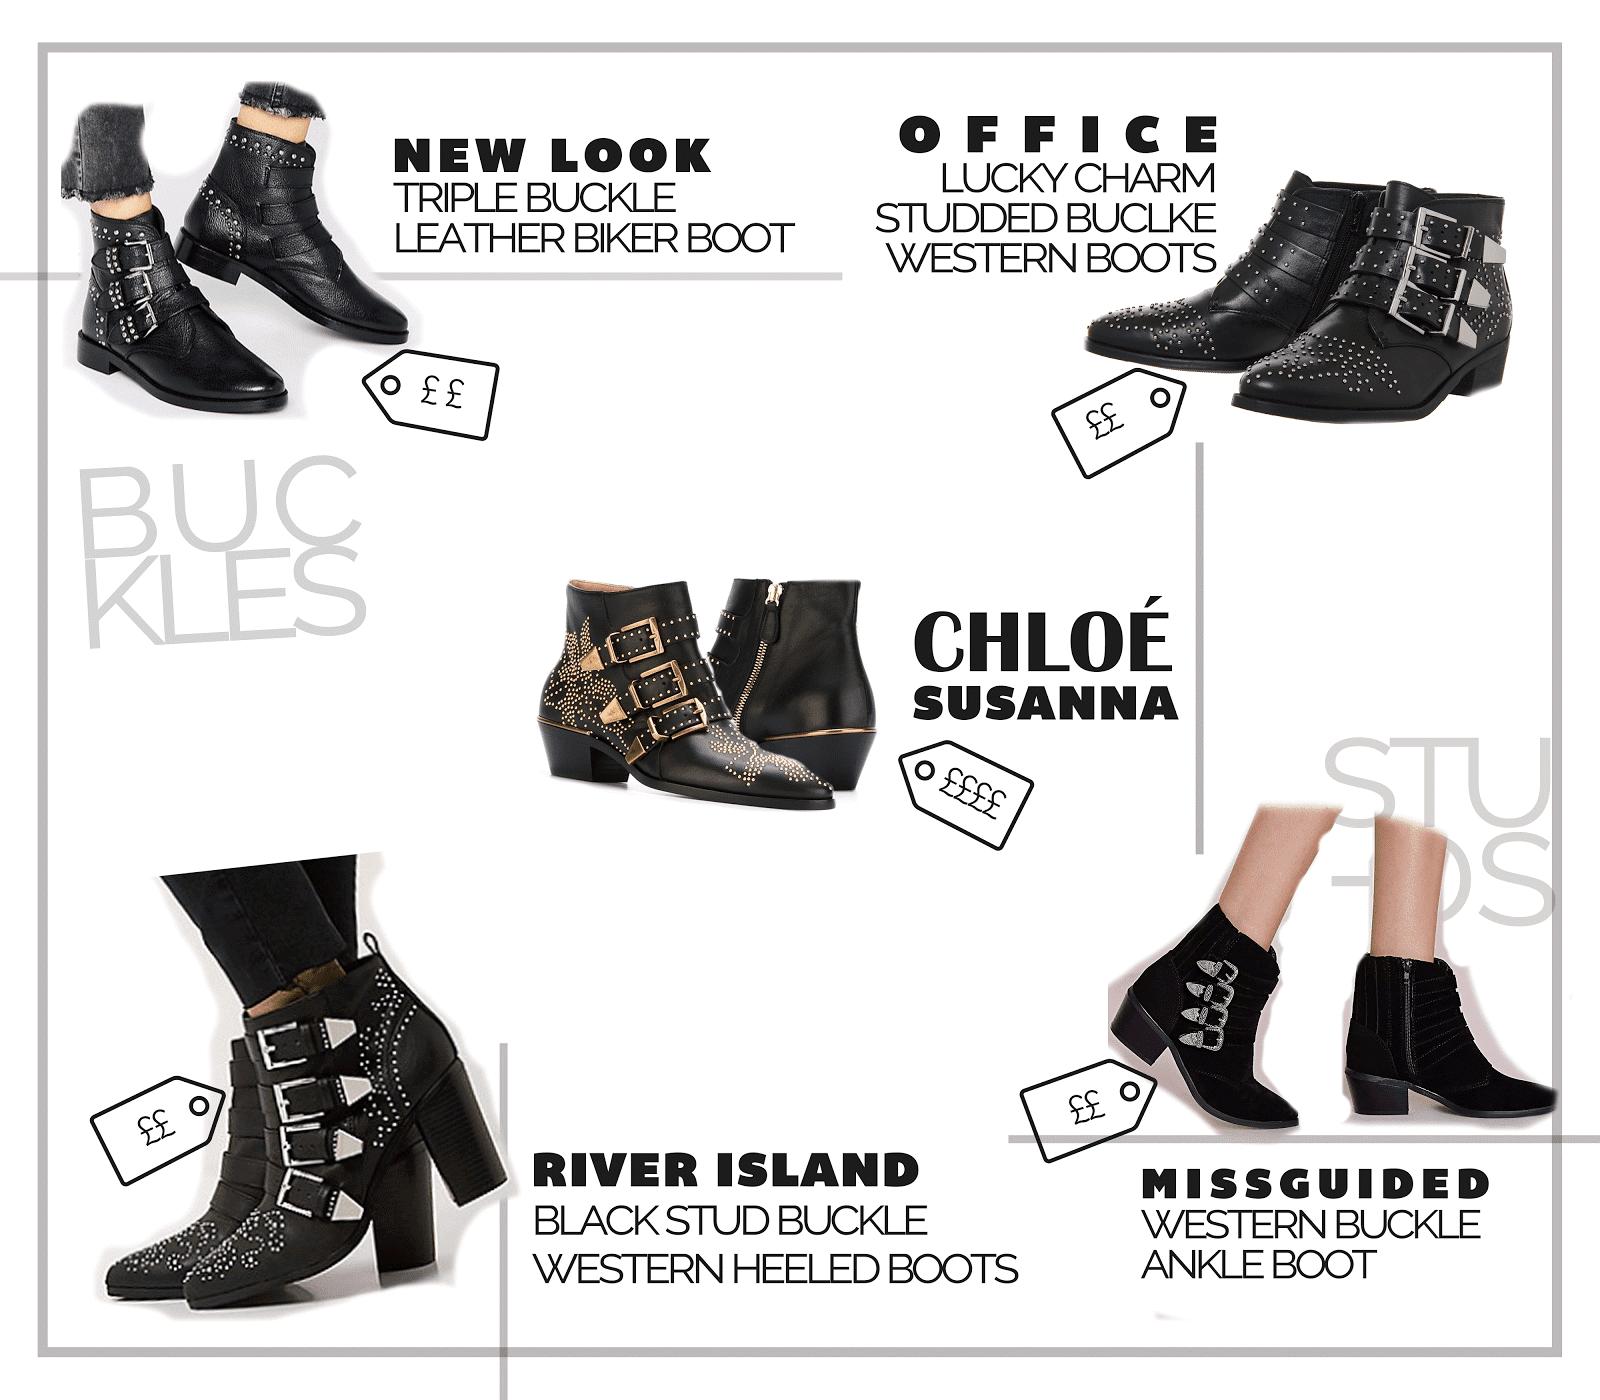 designer shoe chloe susanna western buckle boot high street best dupes